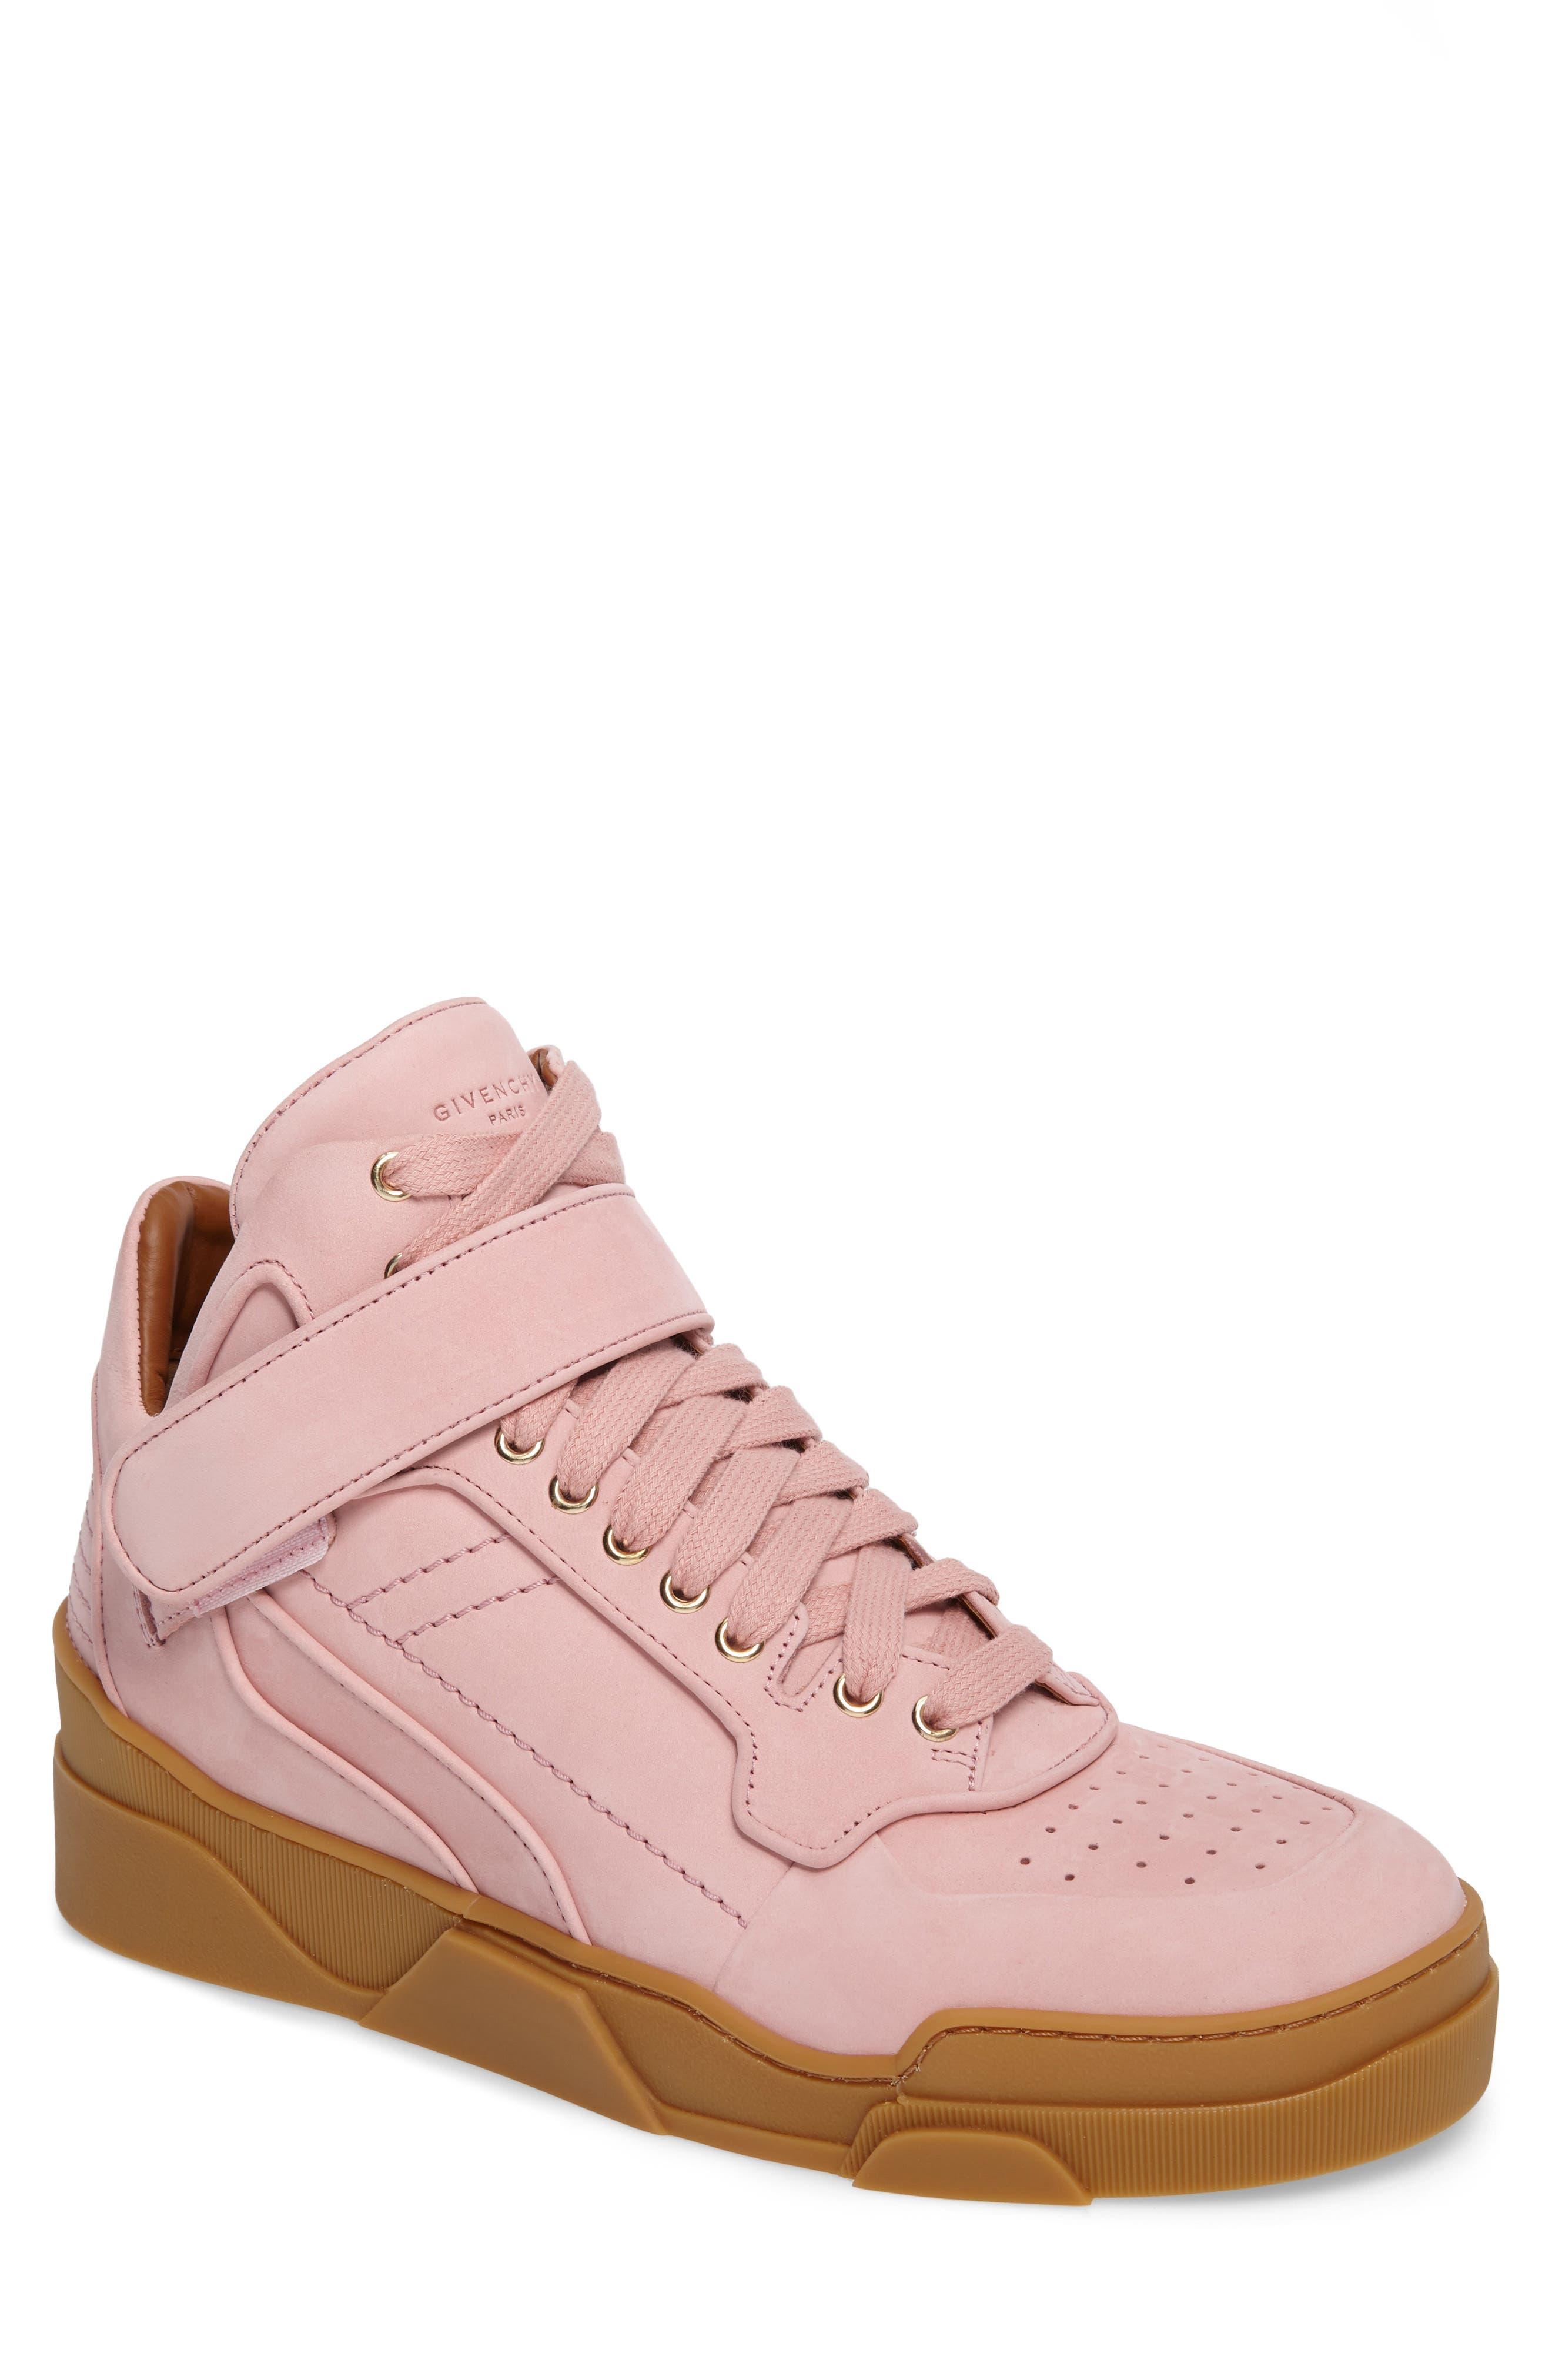 Givenchy High Top Strap Sneaker (Men)